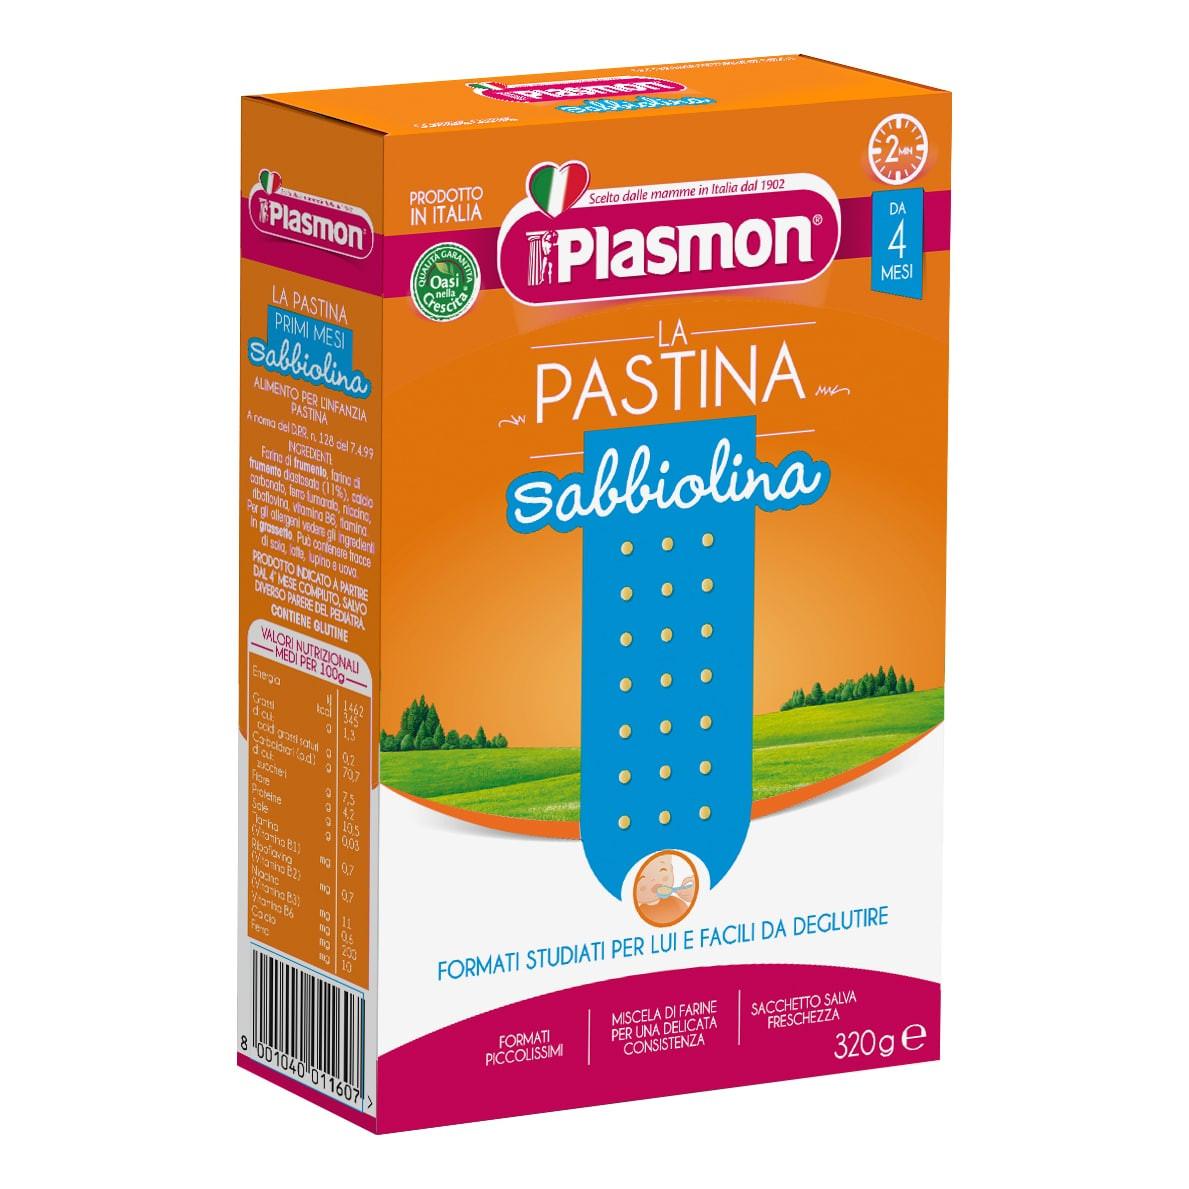 Pastina Sabbiolina Plasmon